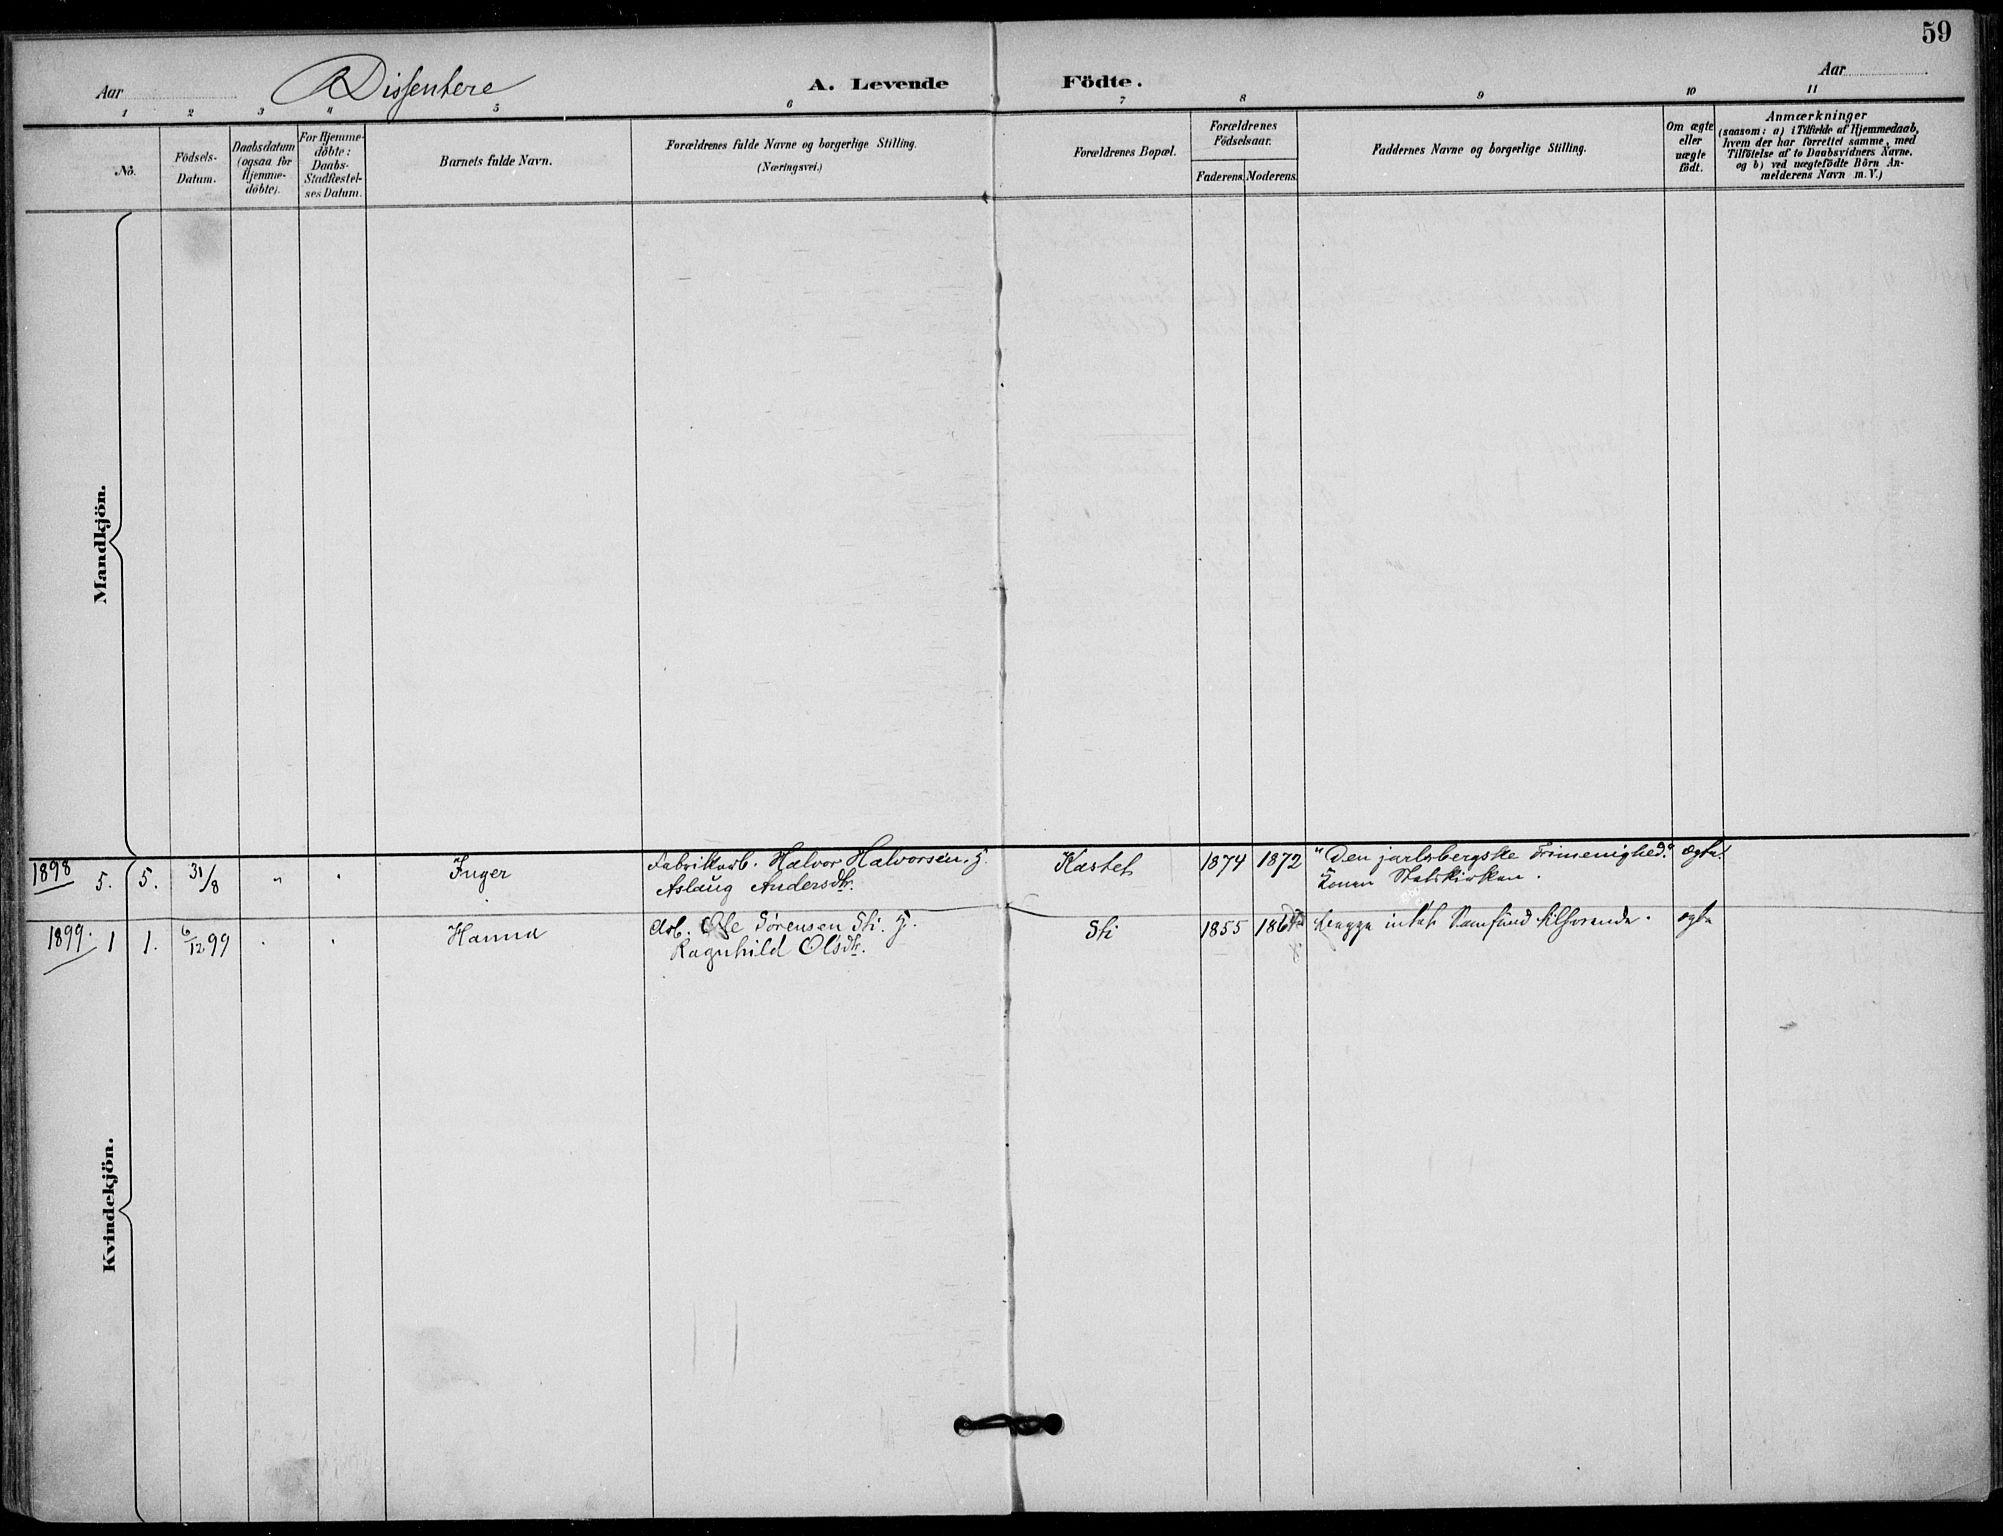 SAKO, Solum kirkebøker, F/Fb/L0002: Ministerialbok nr. II 2, 1893-1901, s. 59